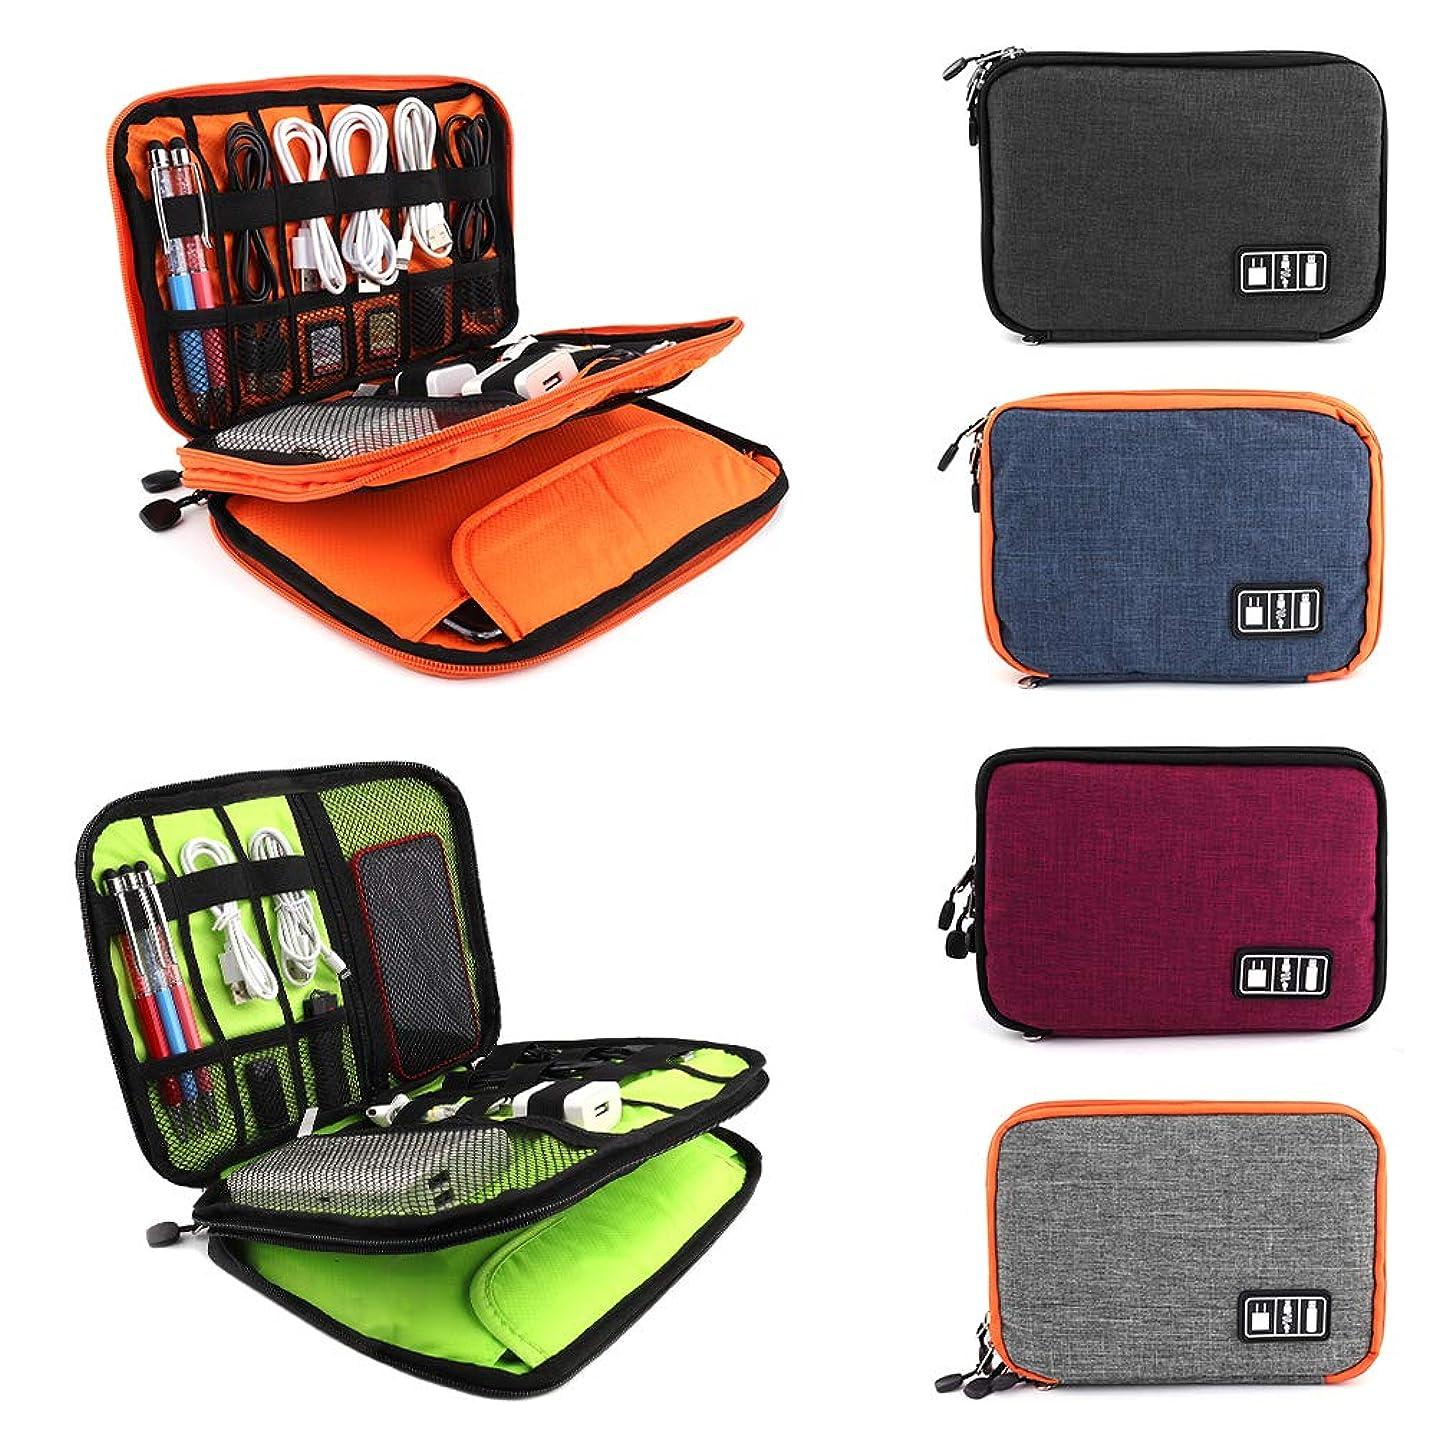 HDWISS Electronics Travel Case for Multifunctional Electronics Bag Waterproof Accessories Bag for Travel Accessories Case Organize Cable/Earphone/Powerbank-Gary